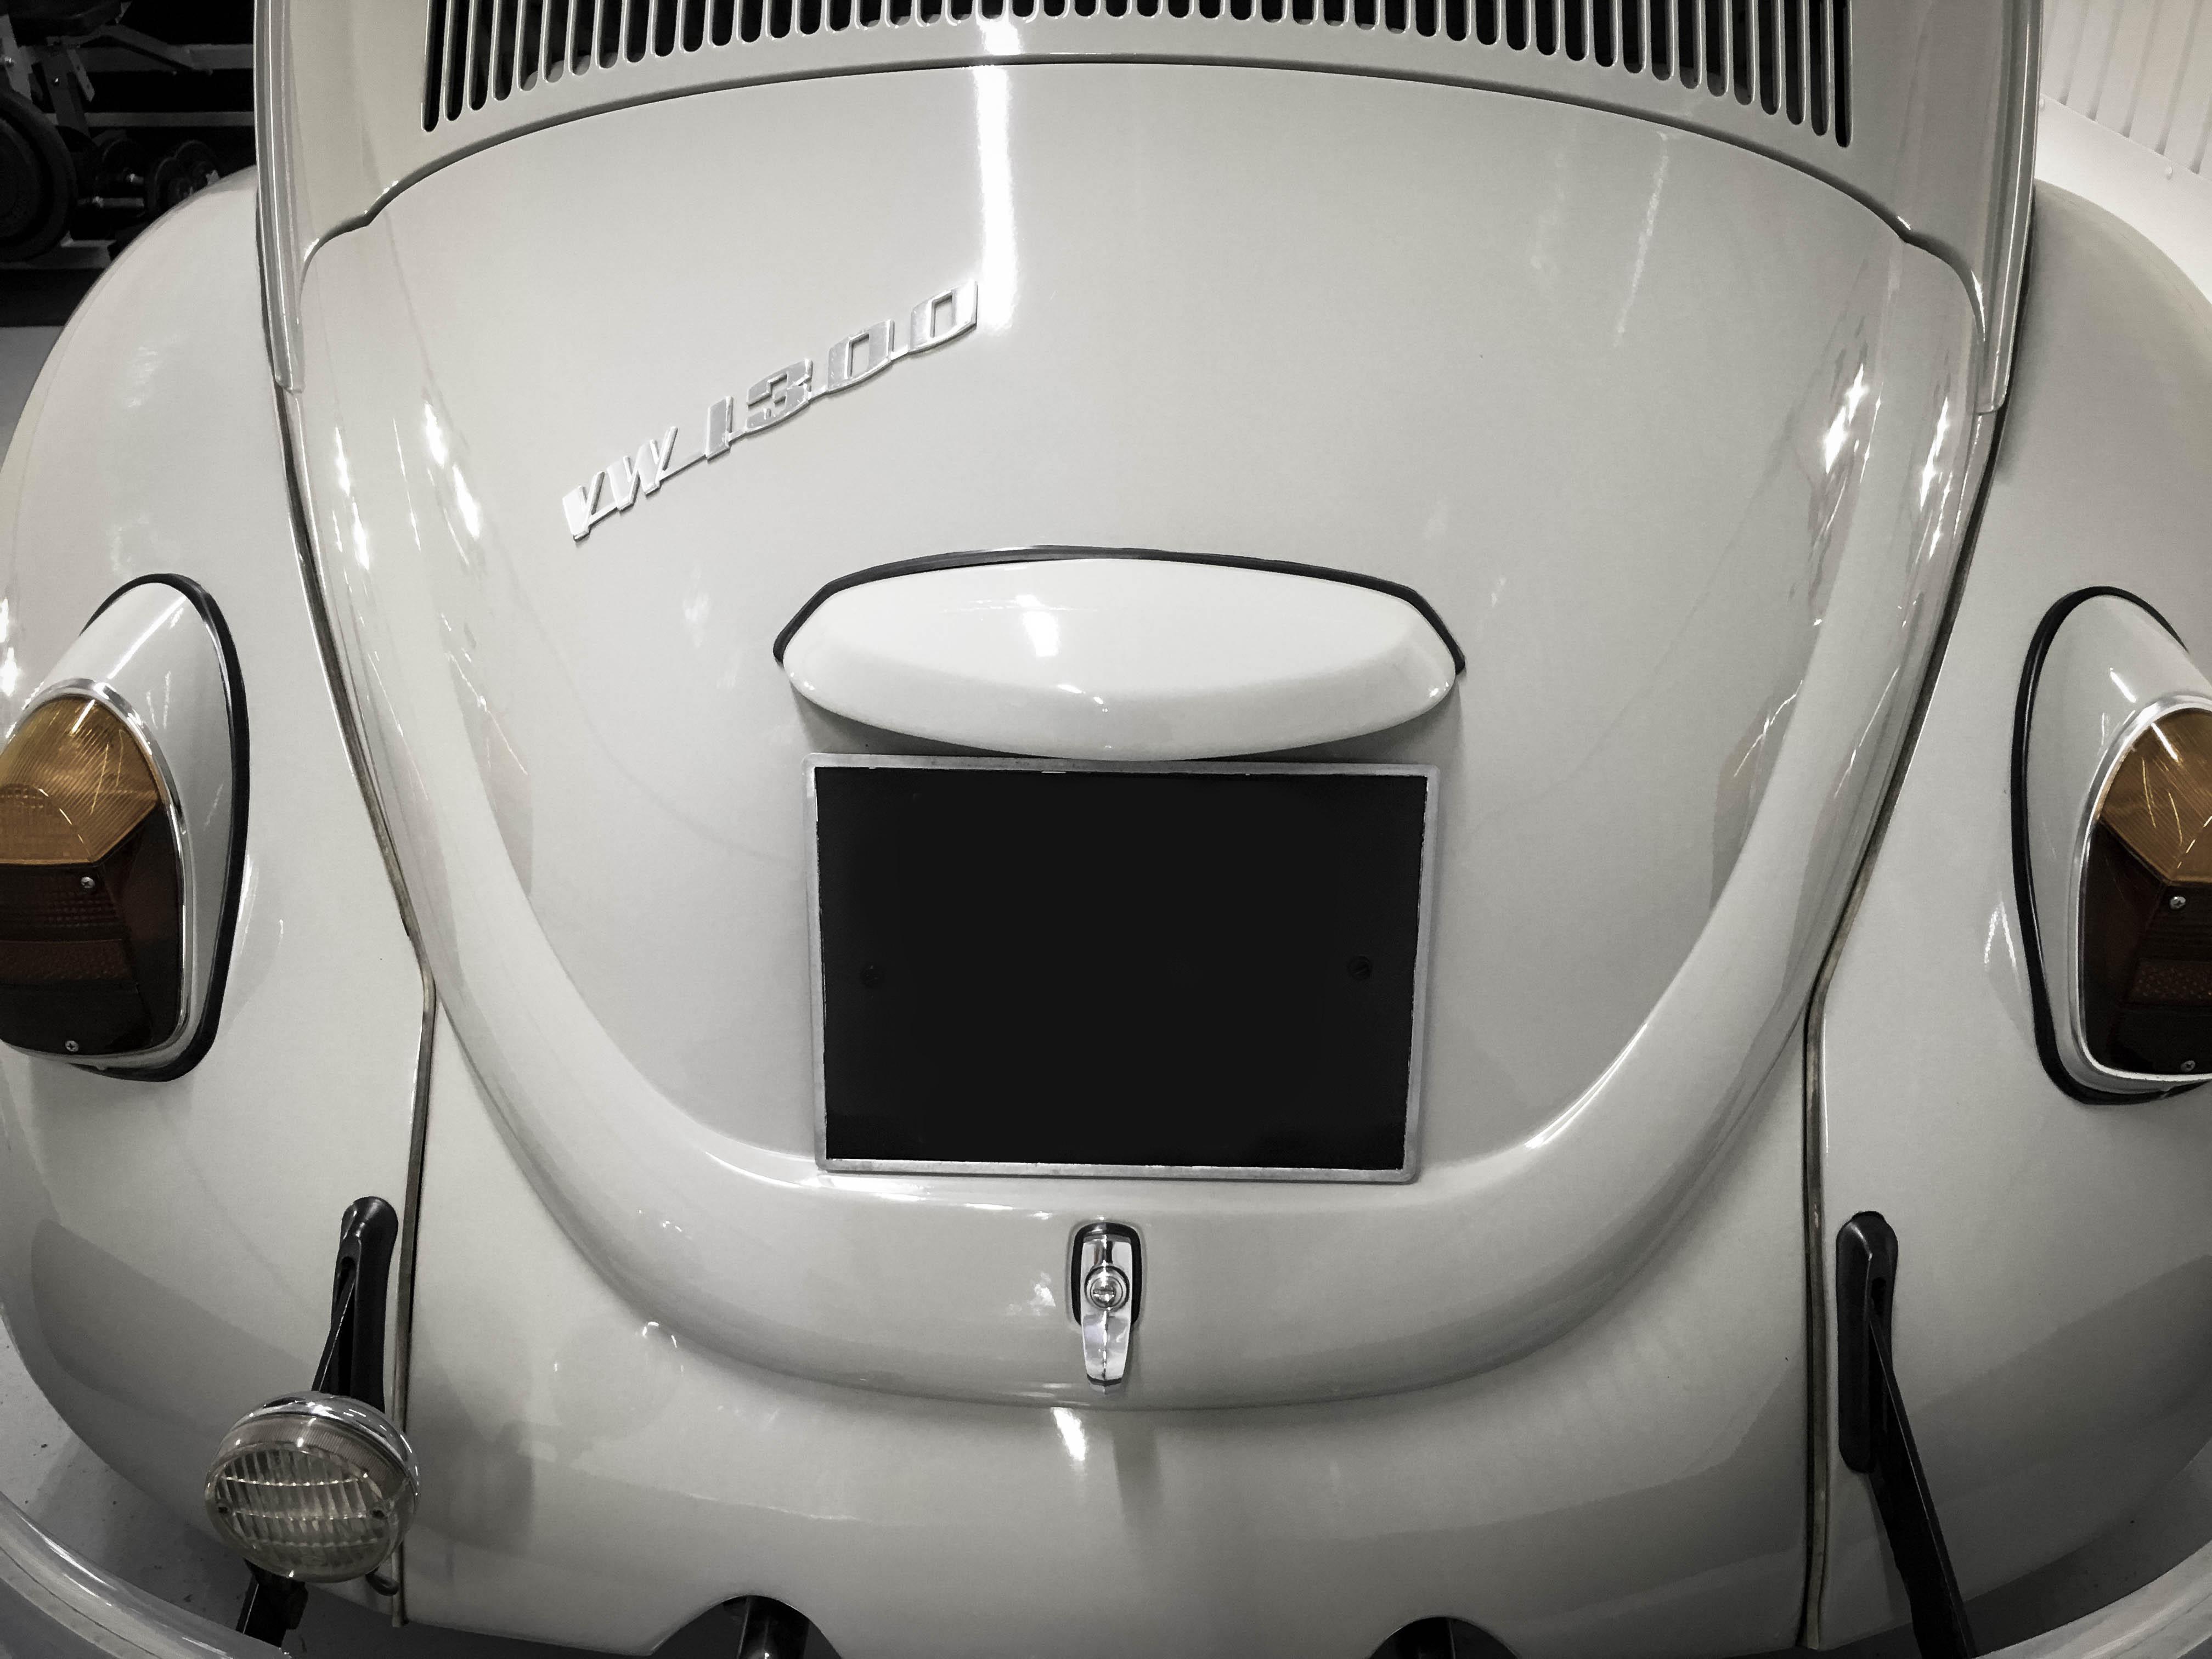 VW-Beetle-backnumberplate